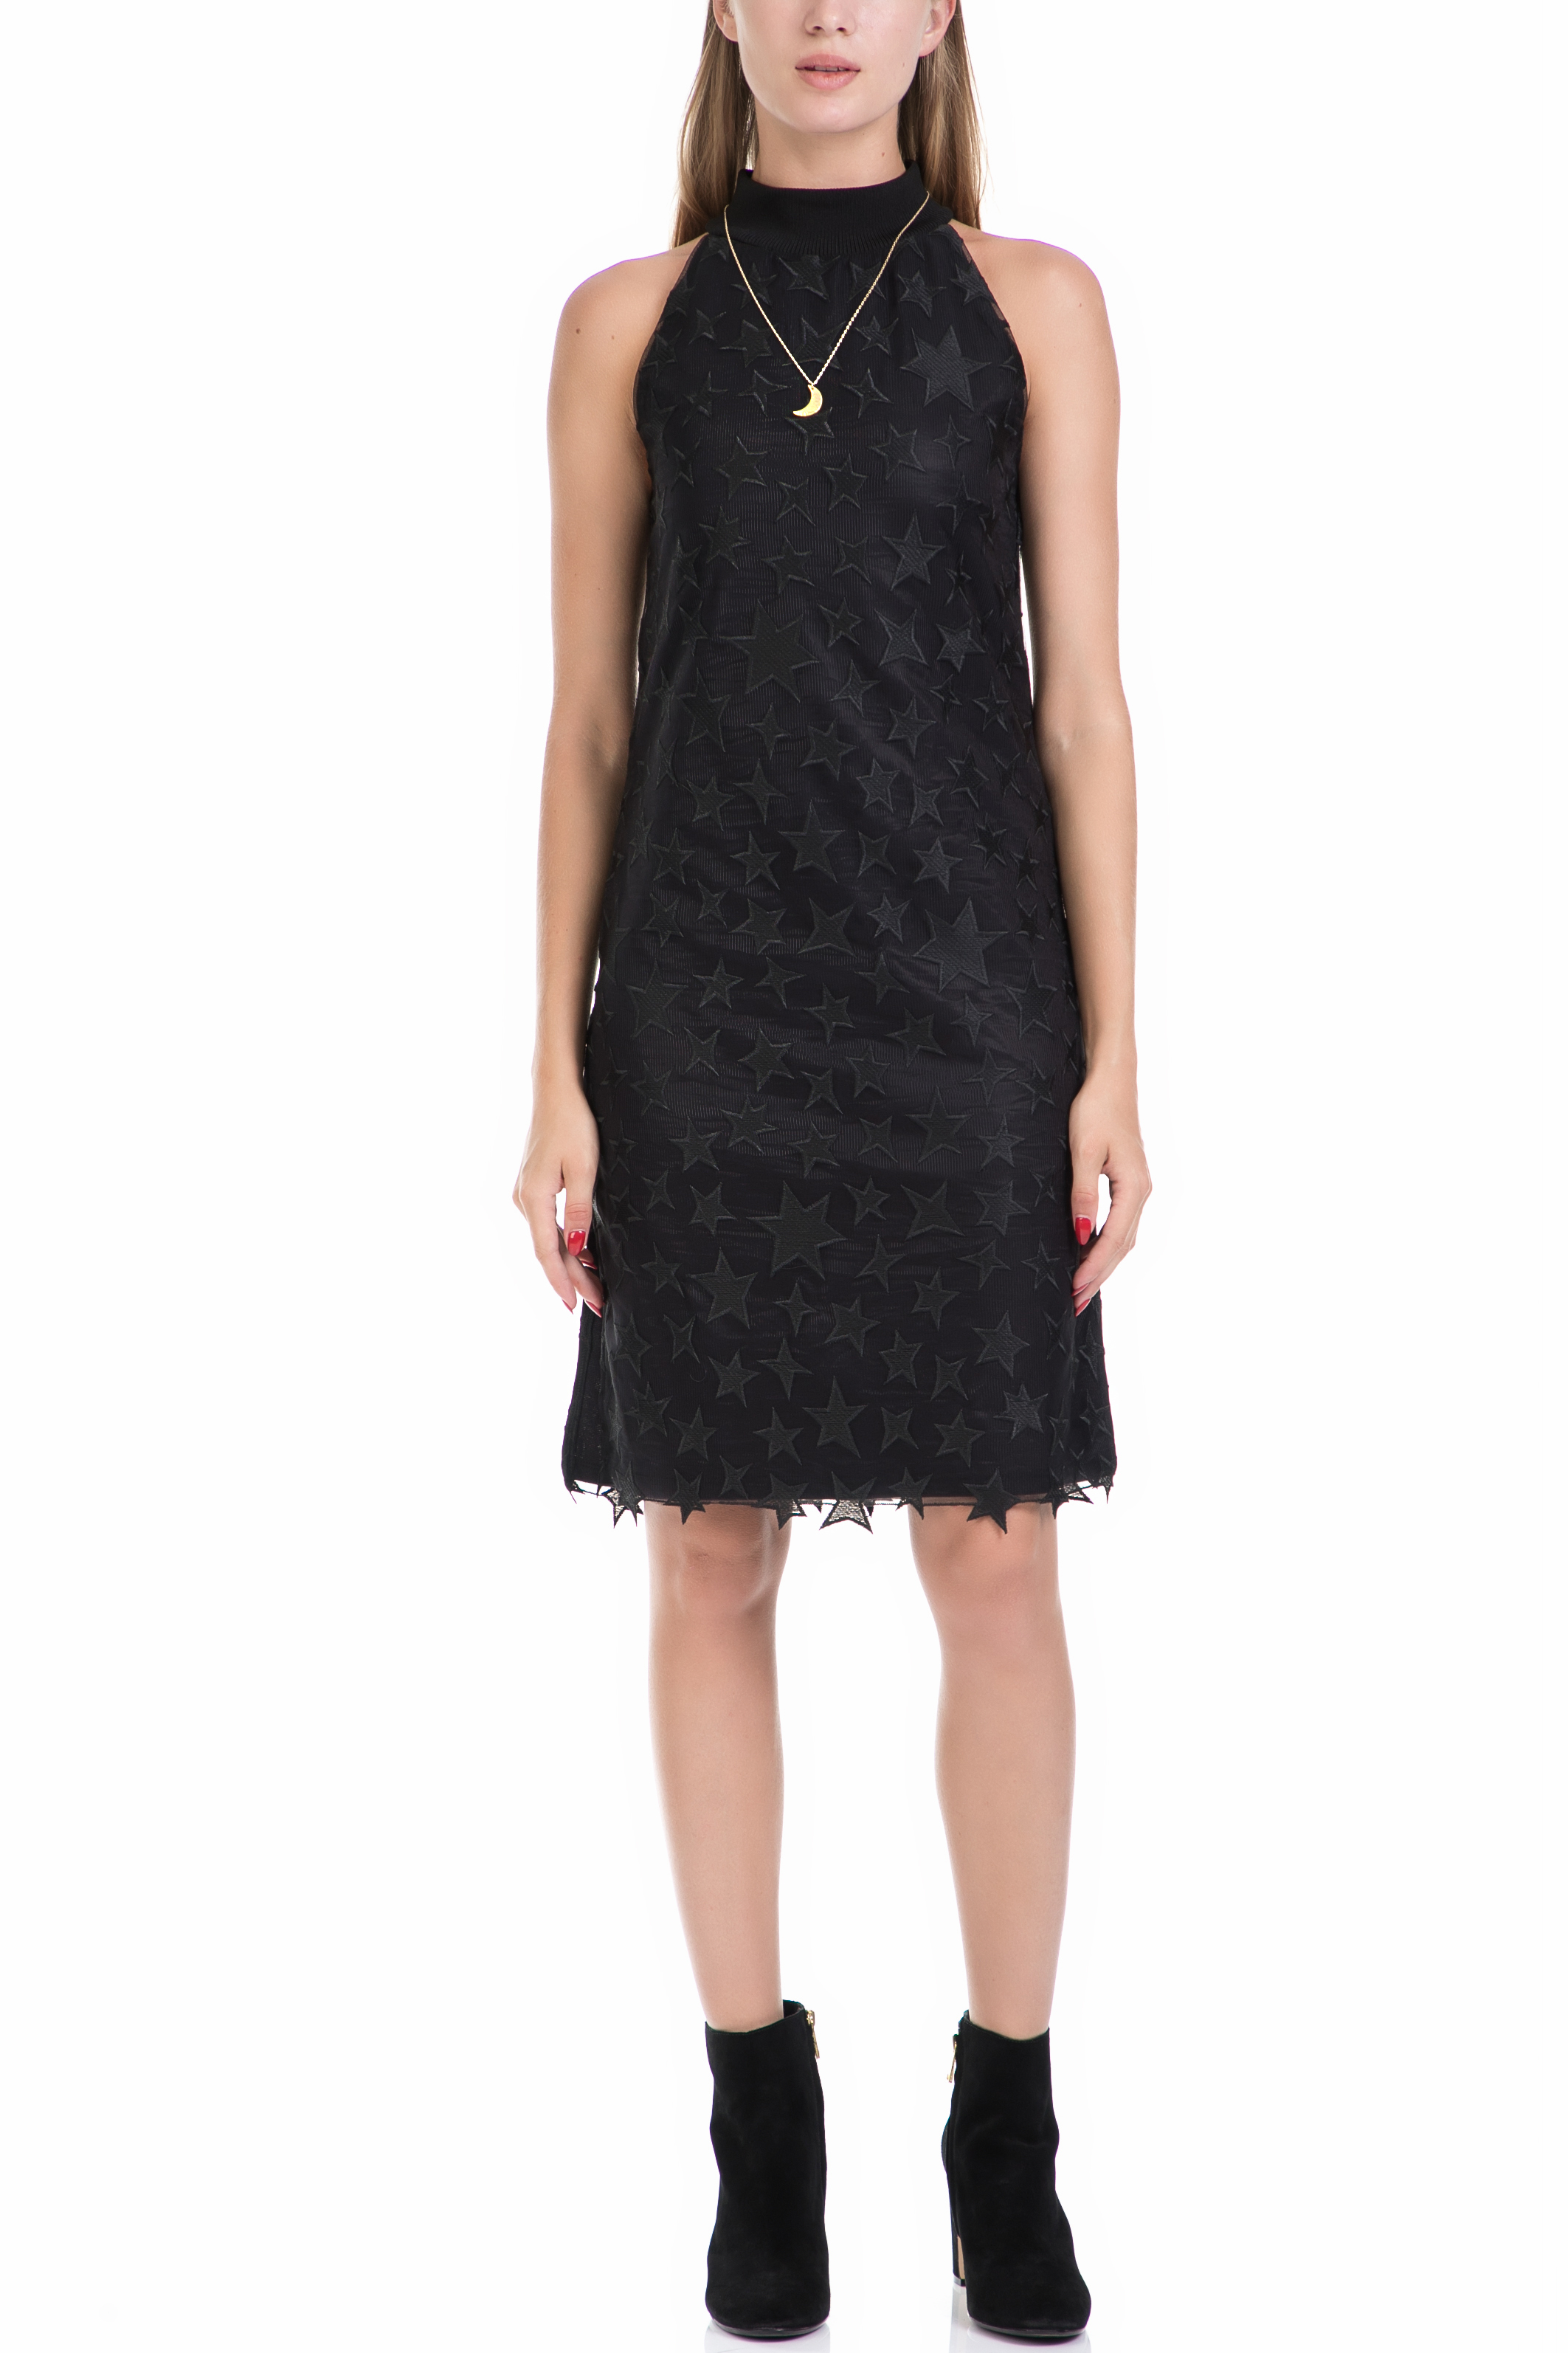 SCOTCH & SODA - Γυναικείο φόρεμα MAISON SCOTCH μαύρο γυναικεία ρούχα φορέματα μέχρι το γόνατο